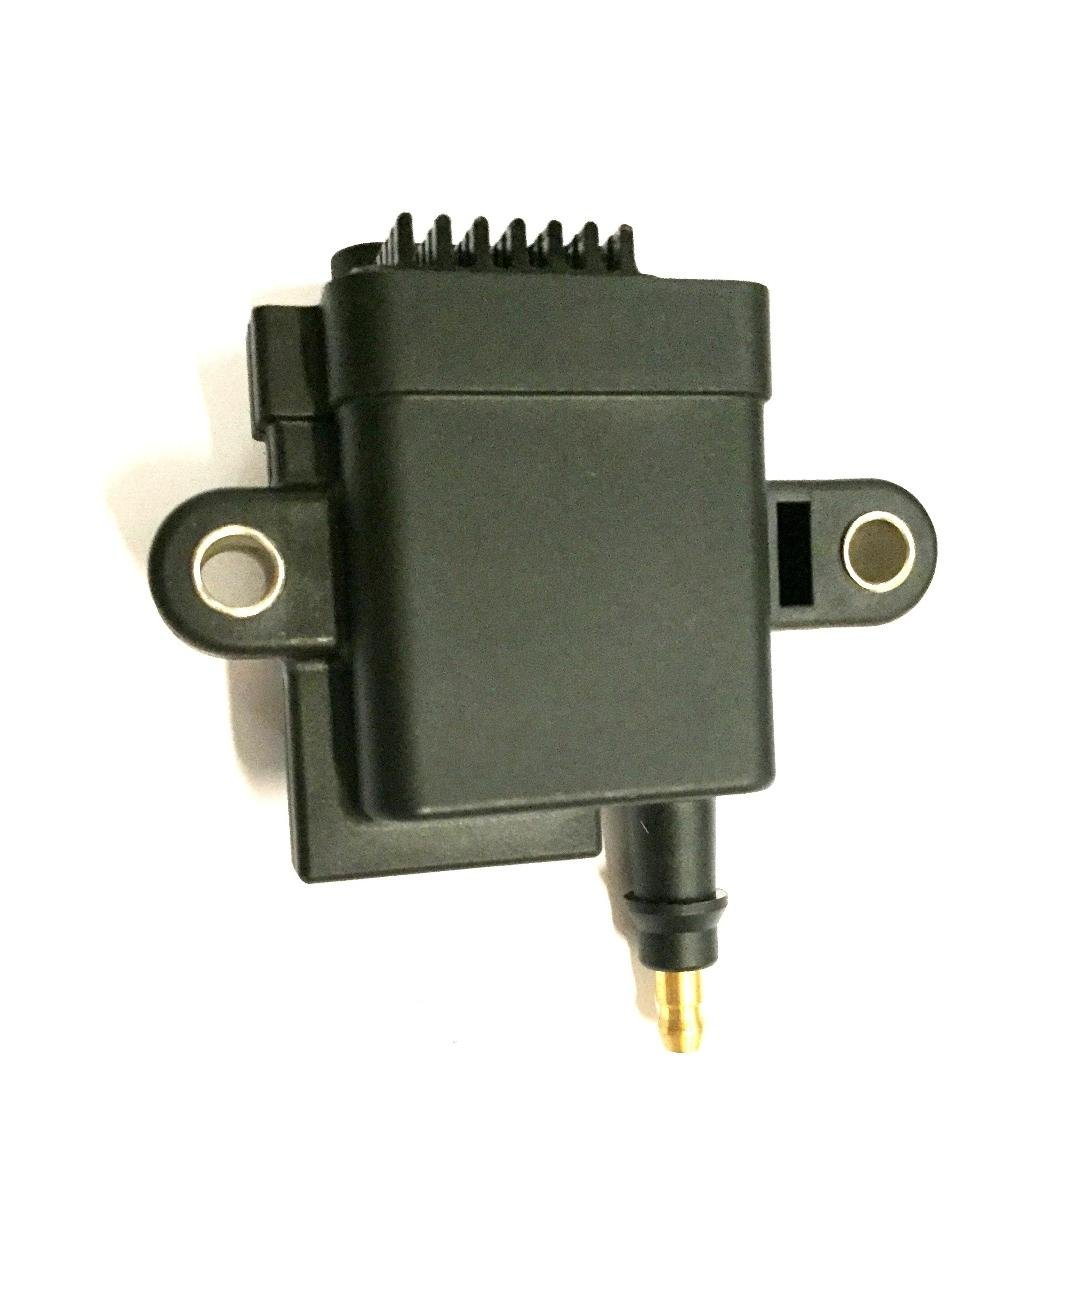 Amazon.com: Automotive Authority Mercury Optimax Ignition Coil 339-879984T00 300-8M0077471 300-879984T01: Sports & Outdoors